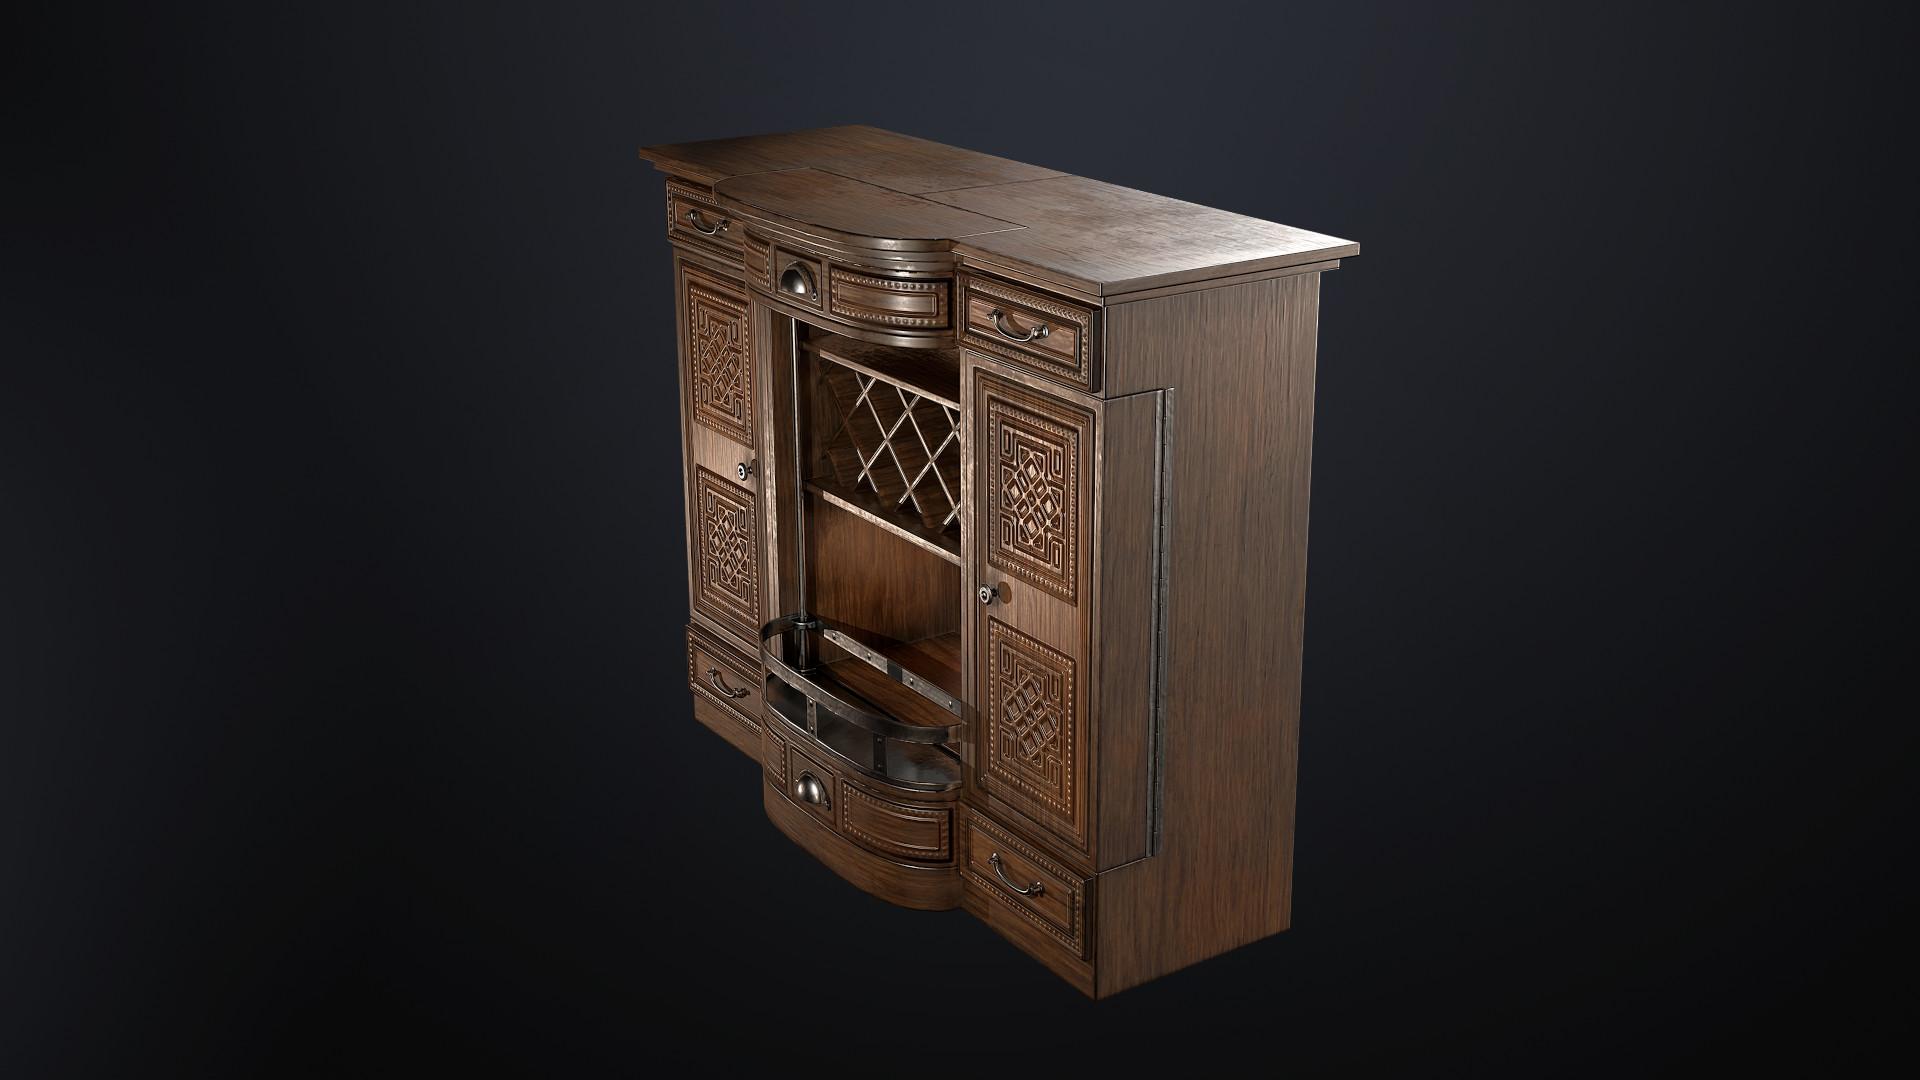 Sami tarvainen liquor cabinet render 4